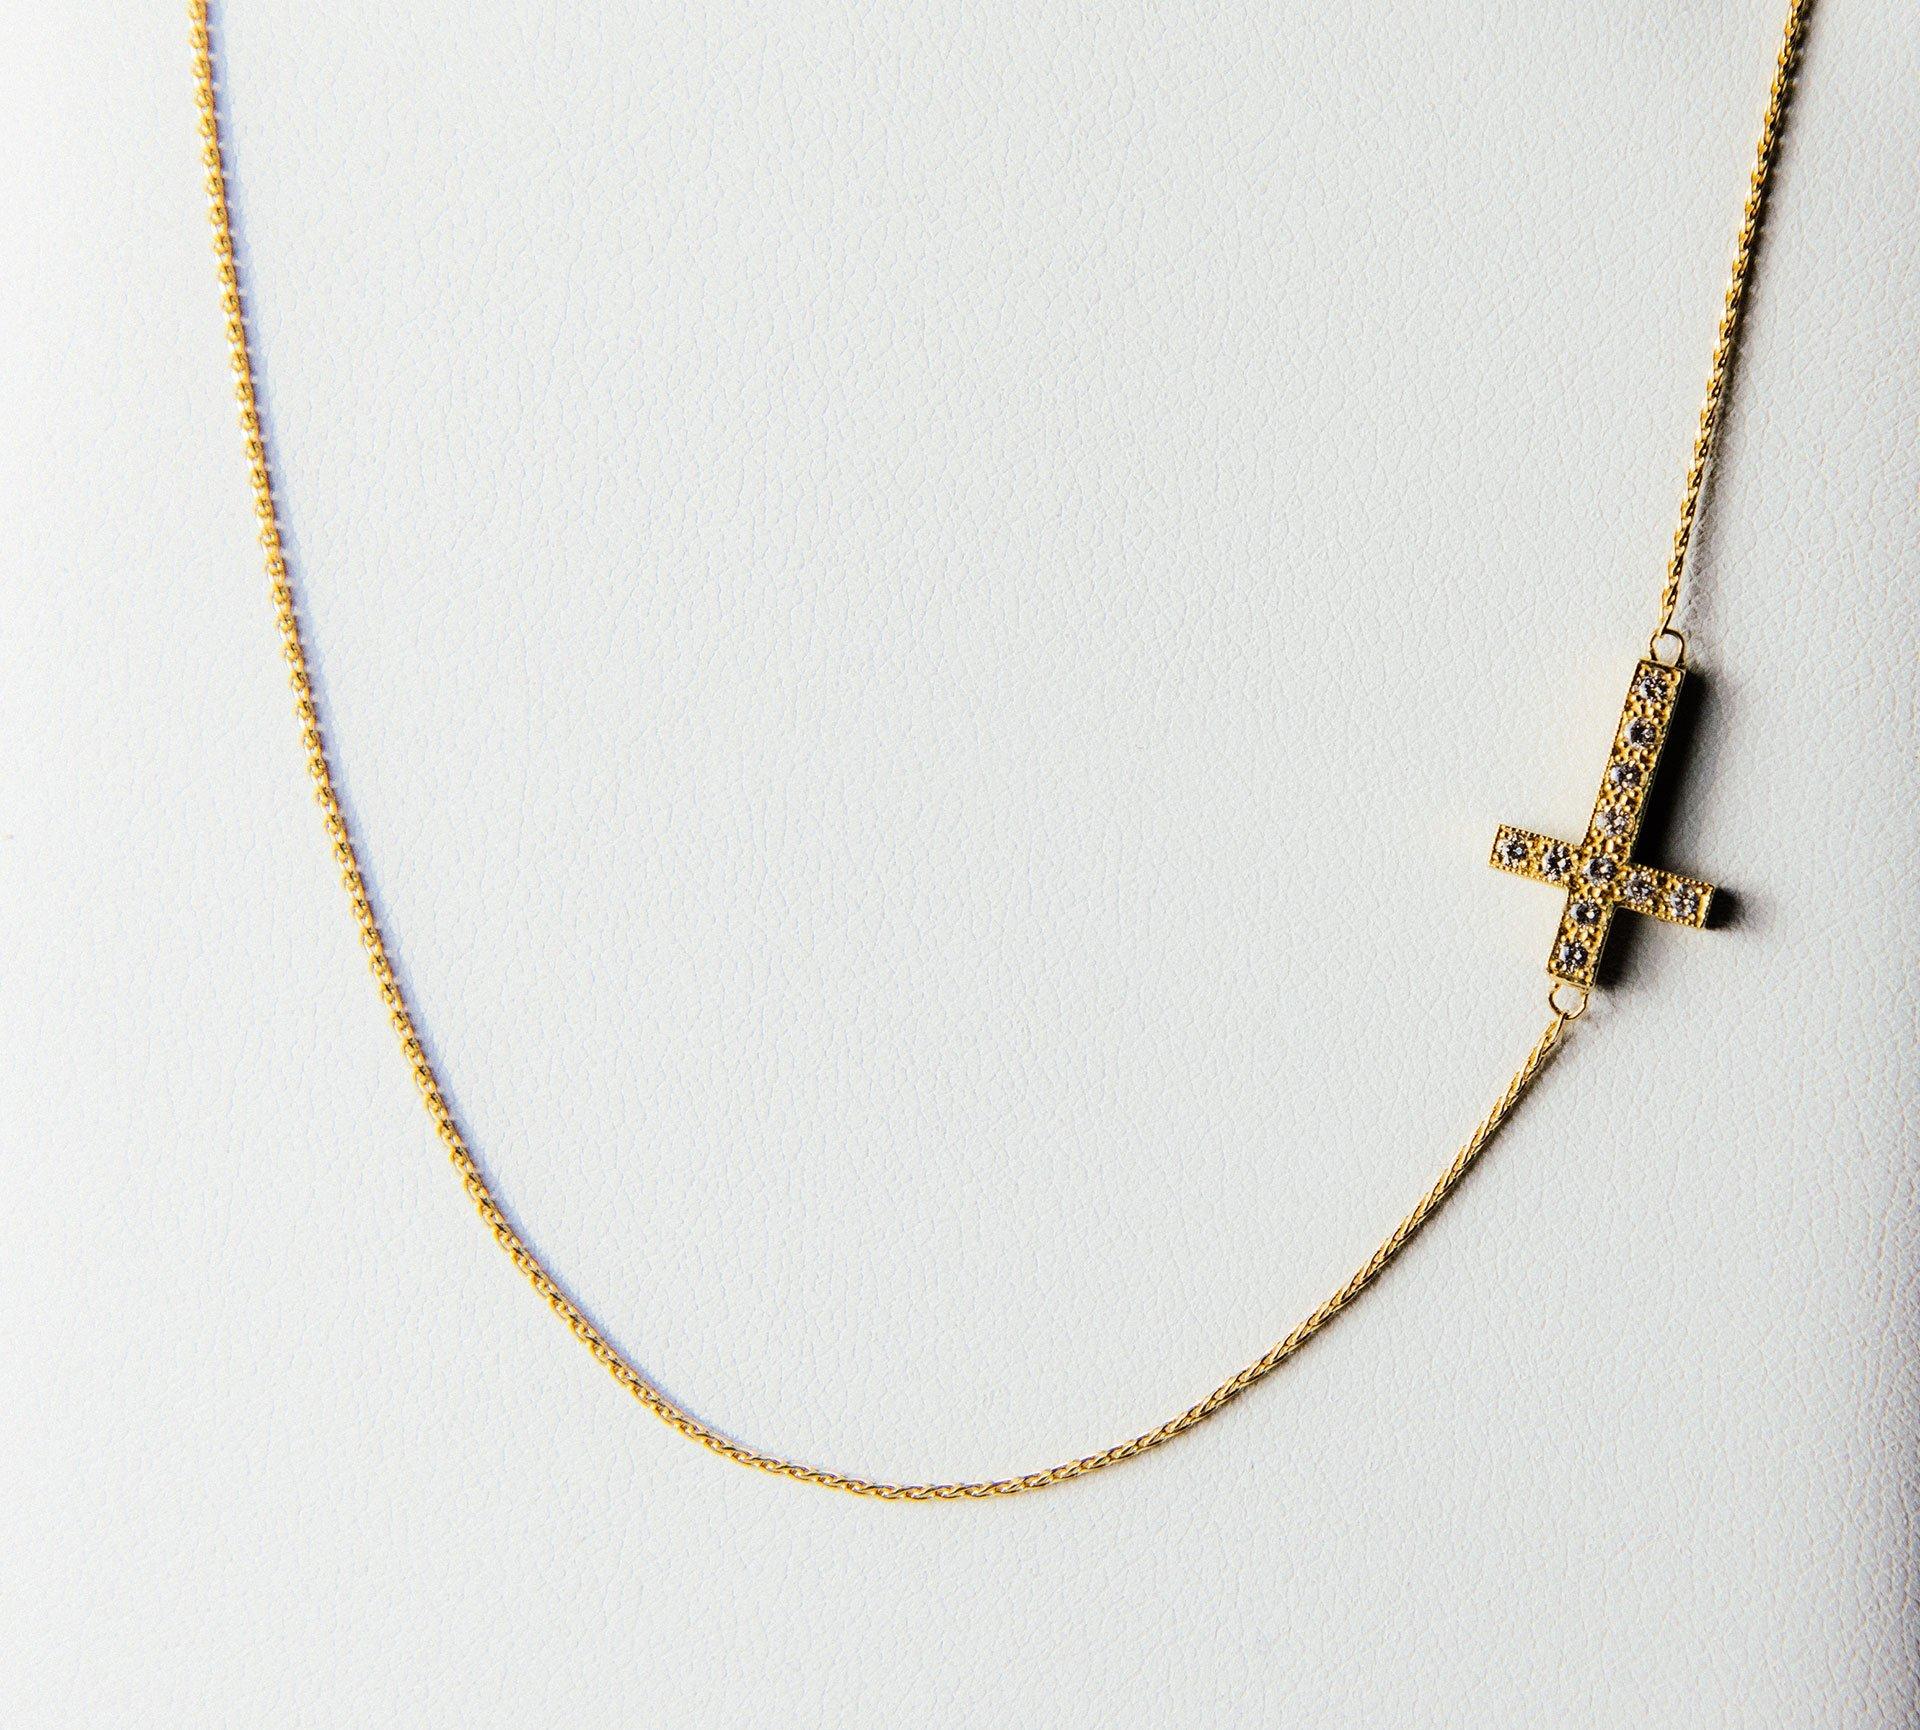 A cross pendant